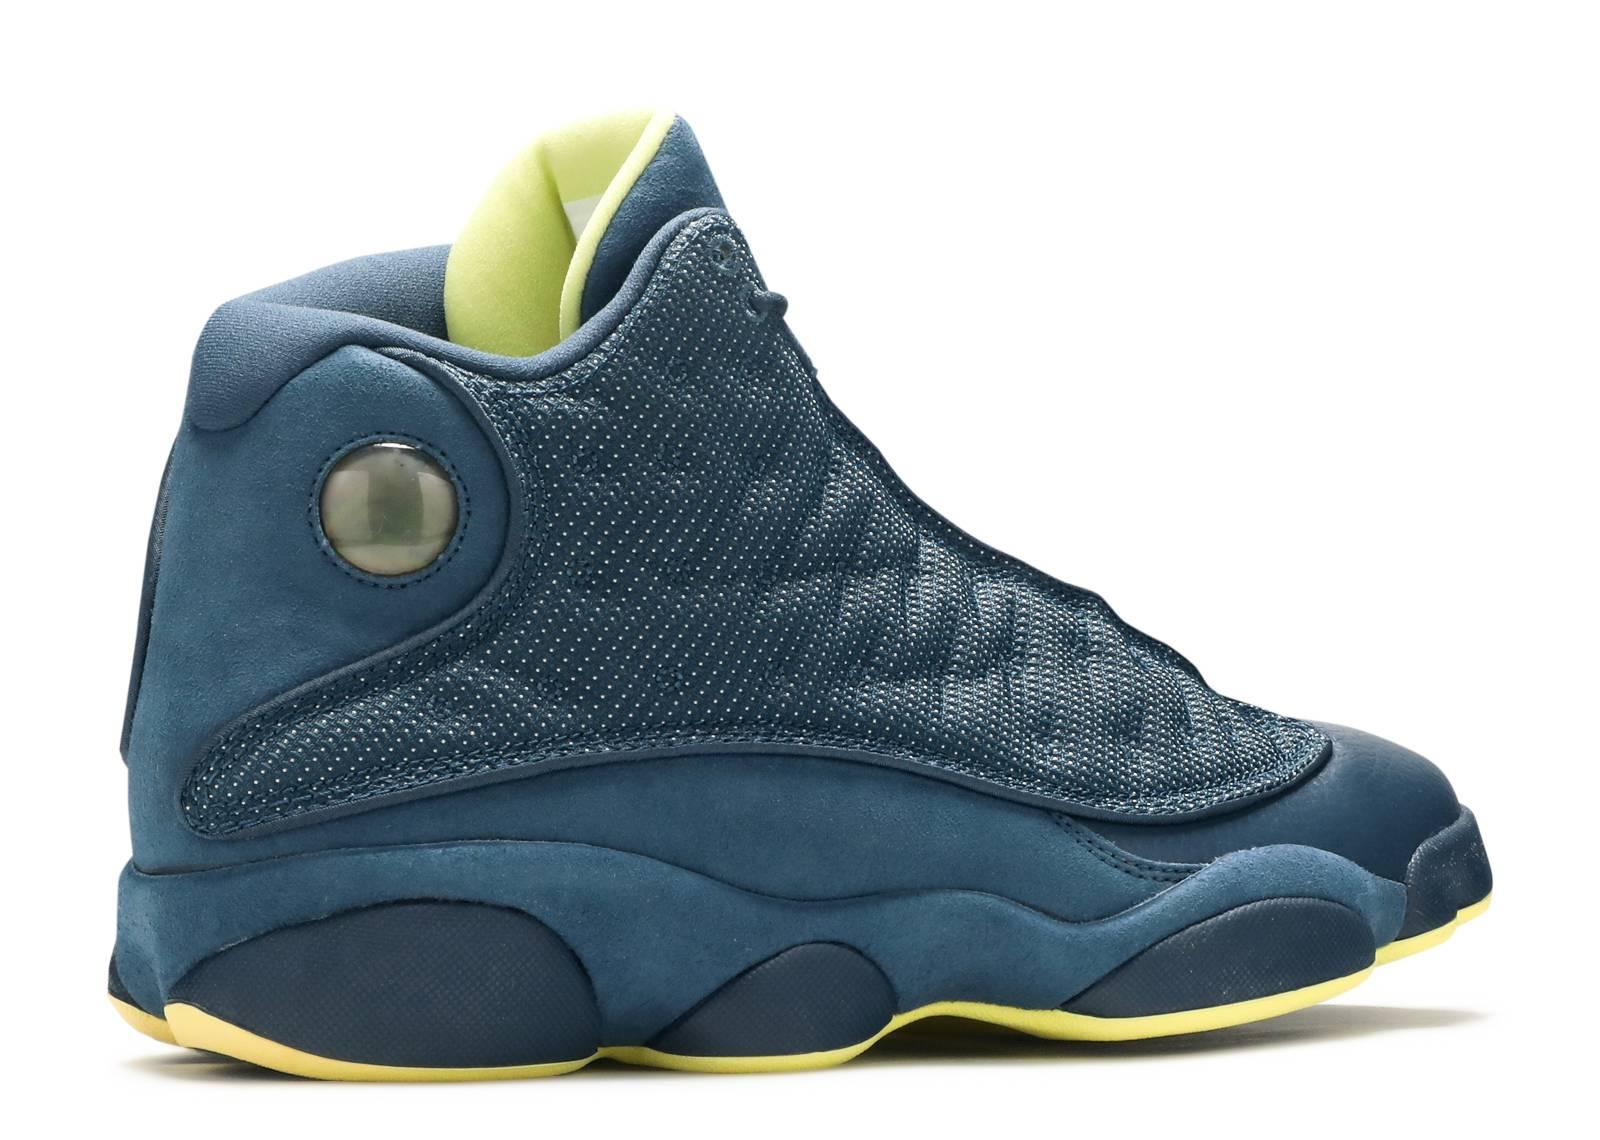 size 40 0ce0f 57097 Air Jordan 13 Retro